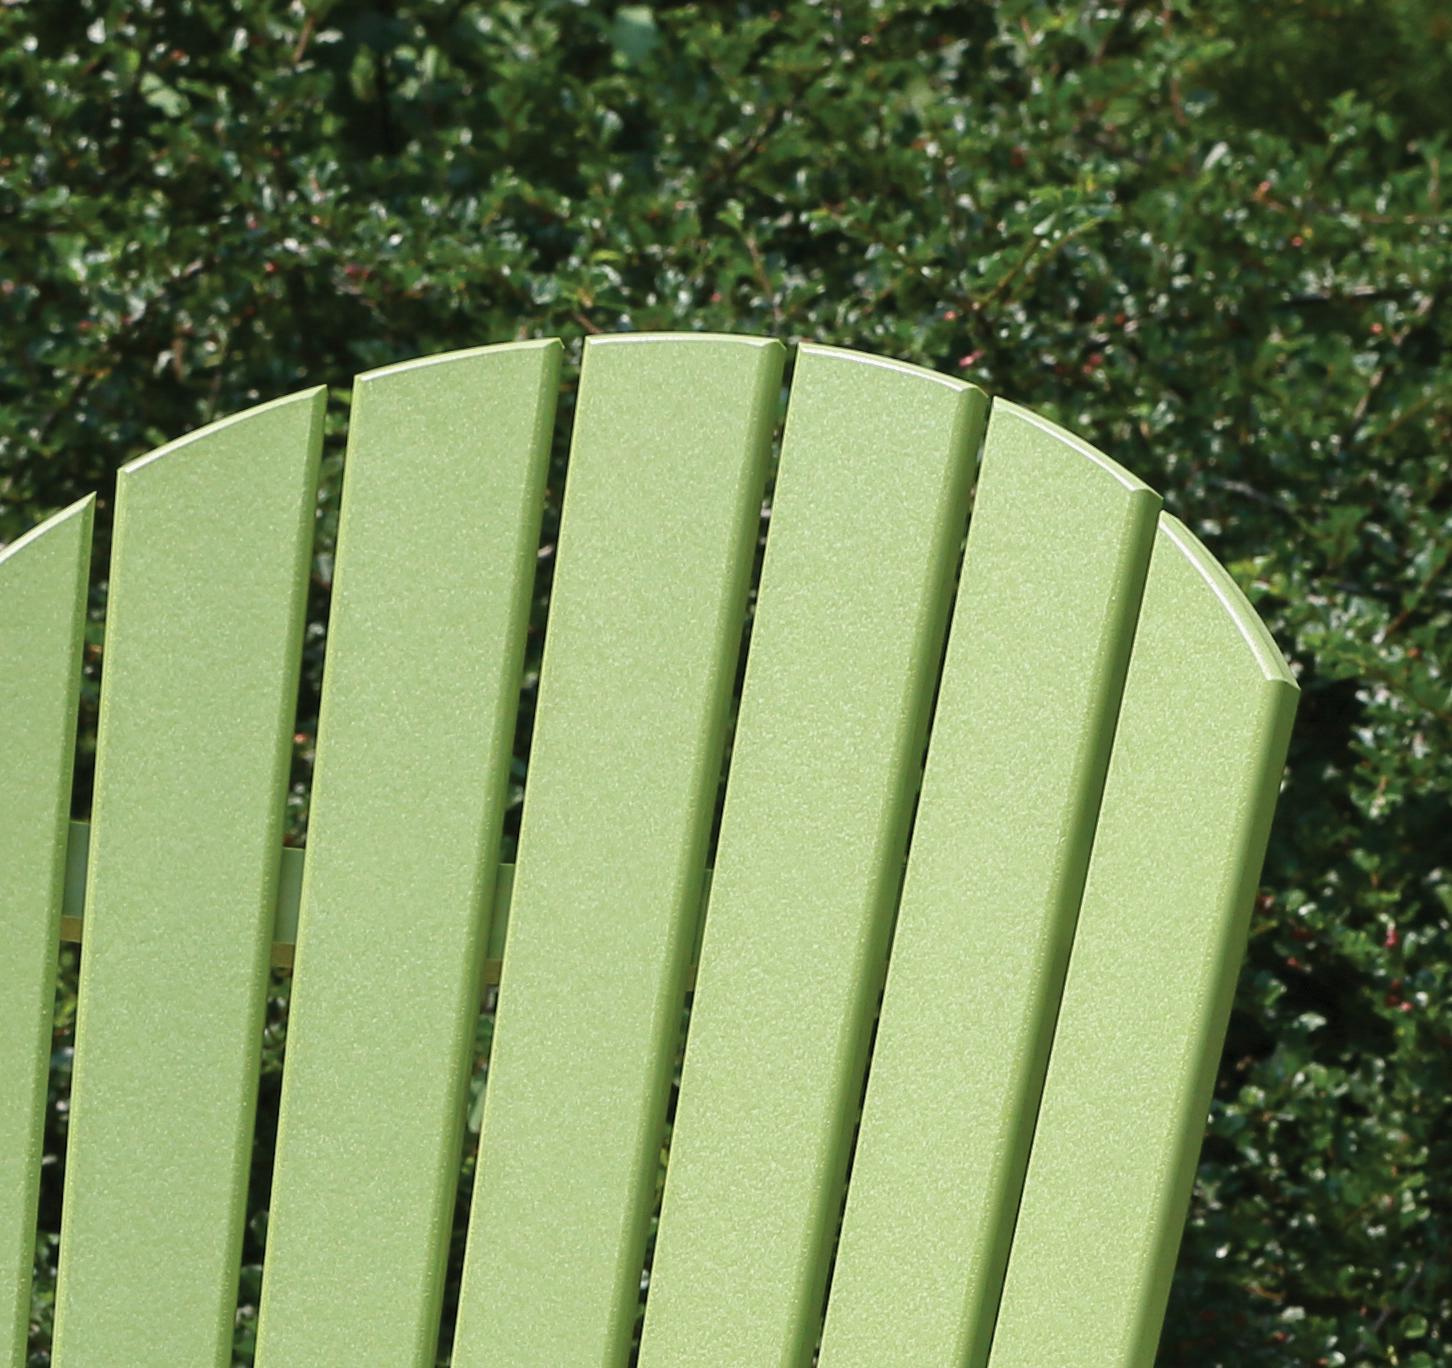 No screws in surface of back slats